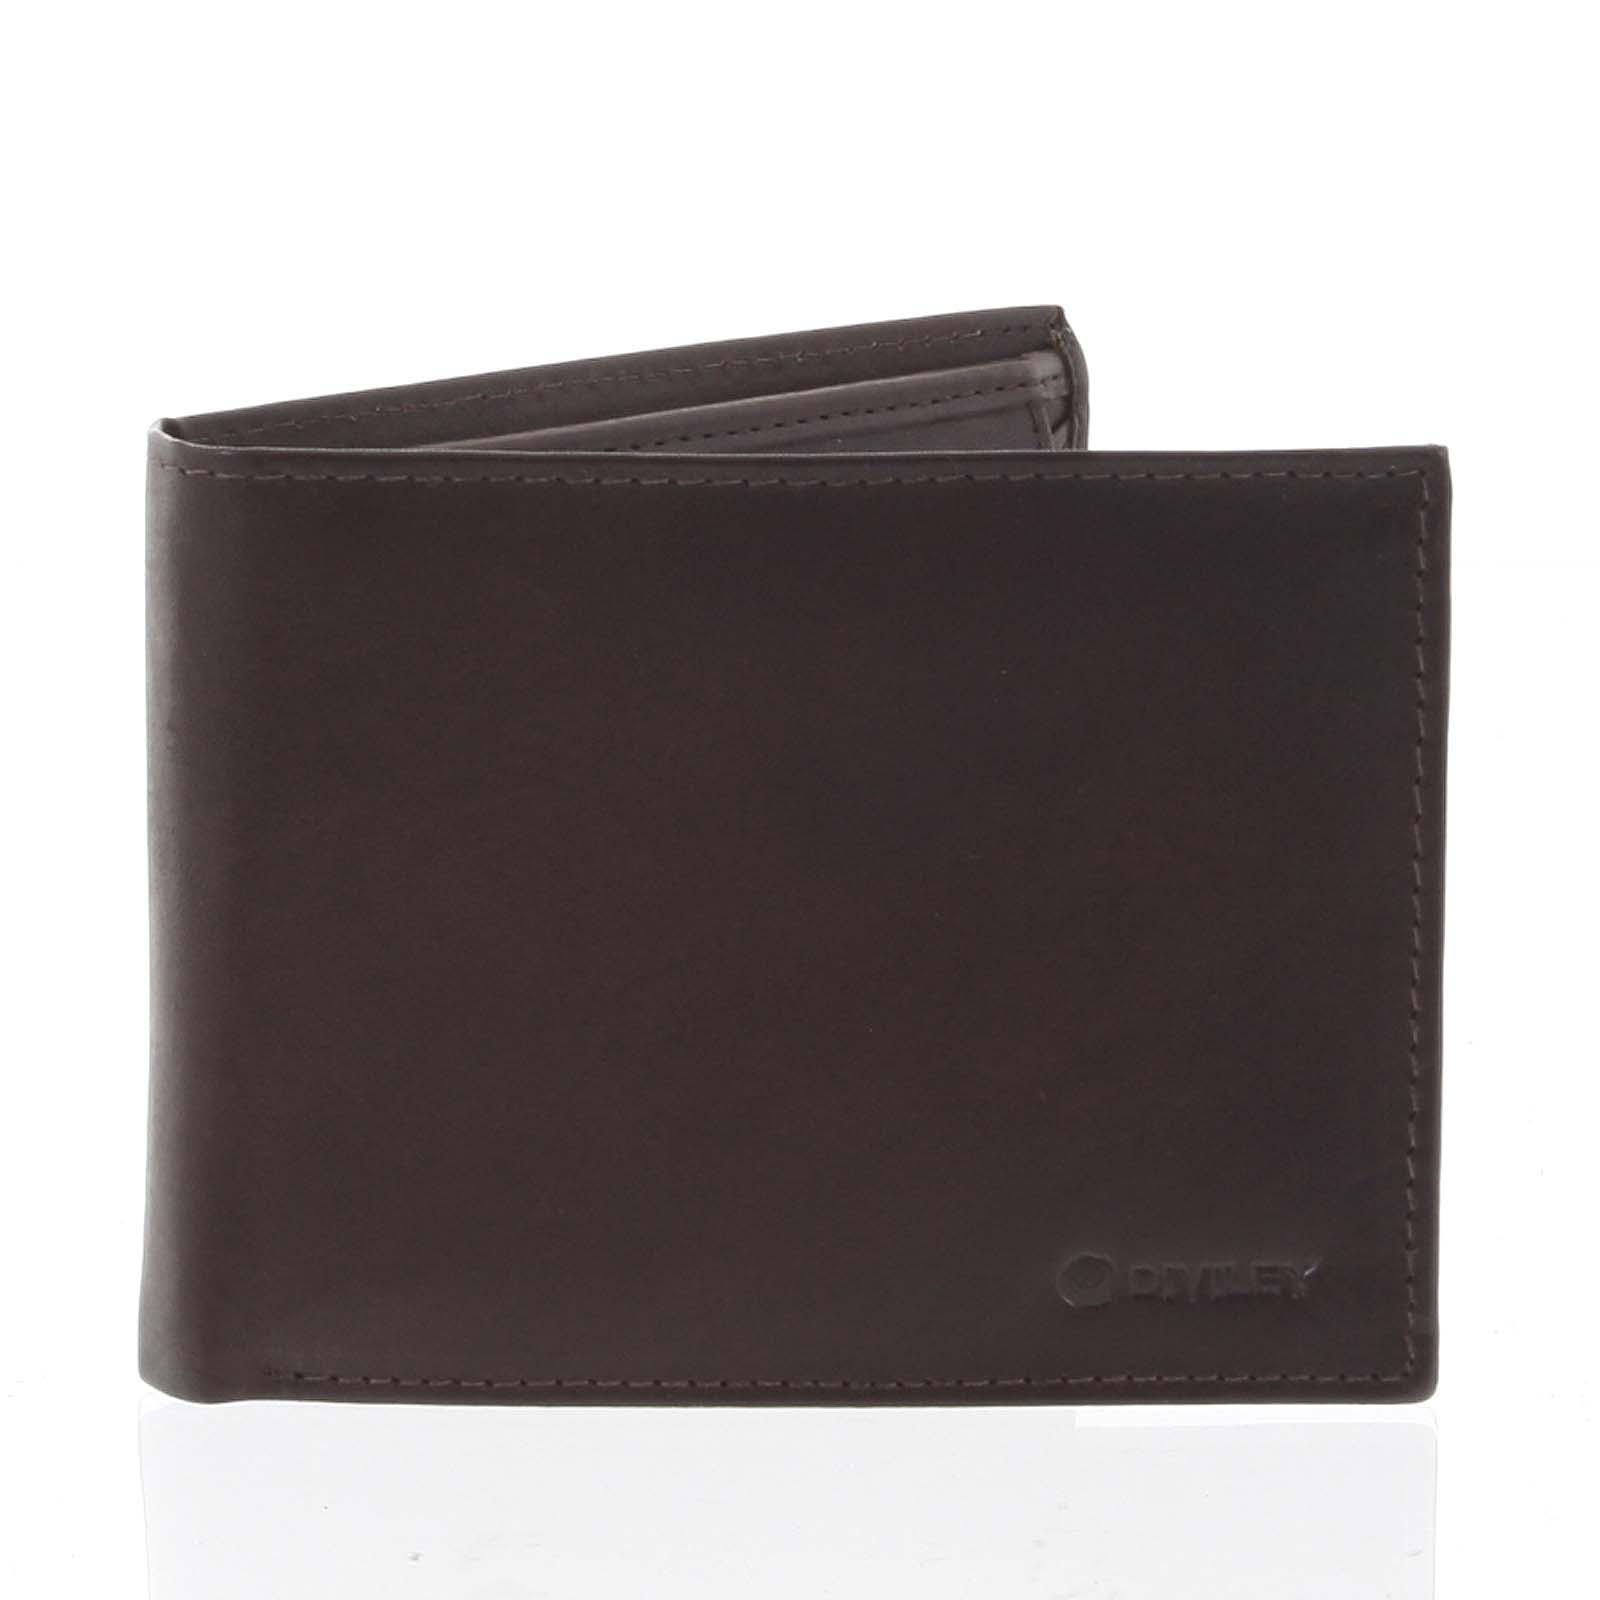 Pánská volná hnědá kožená peněženka - Diviley Cycbet